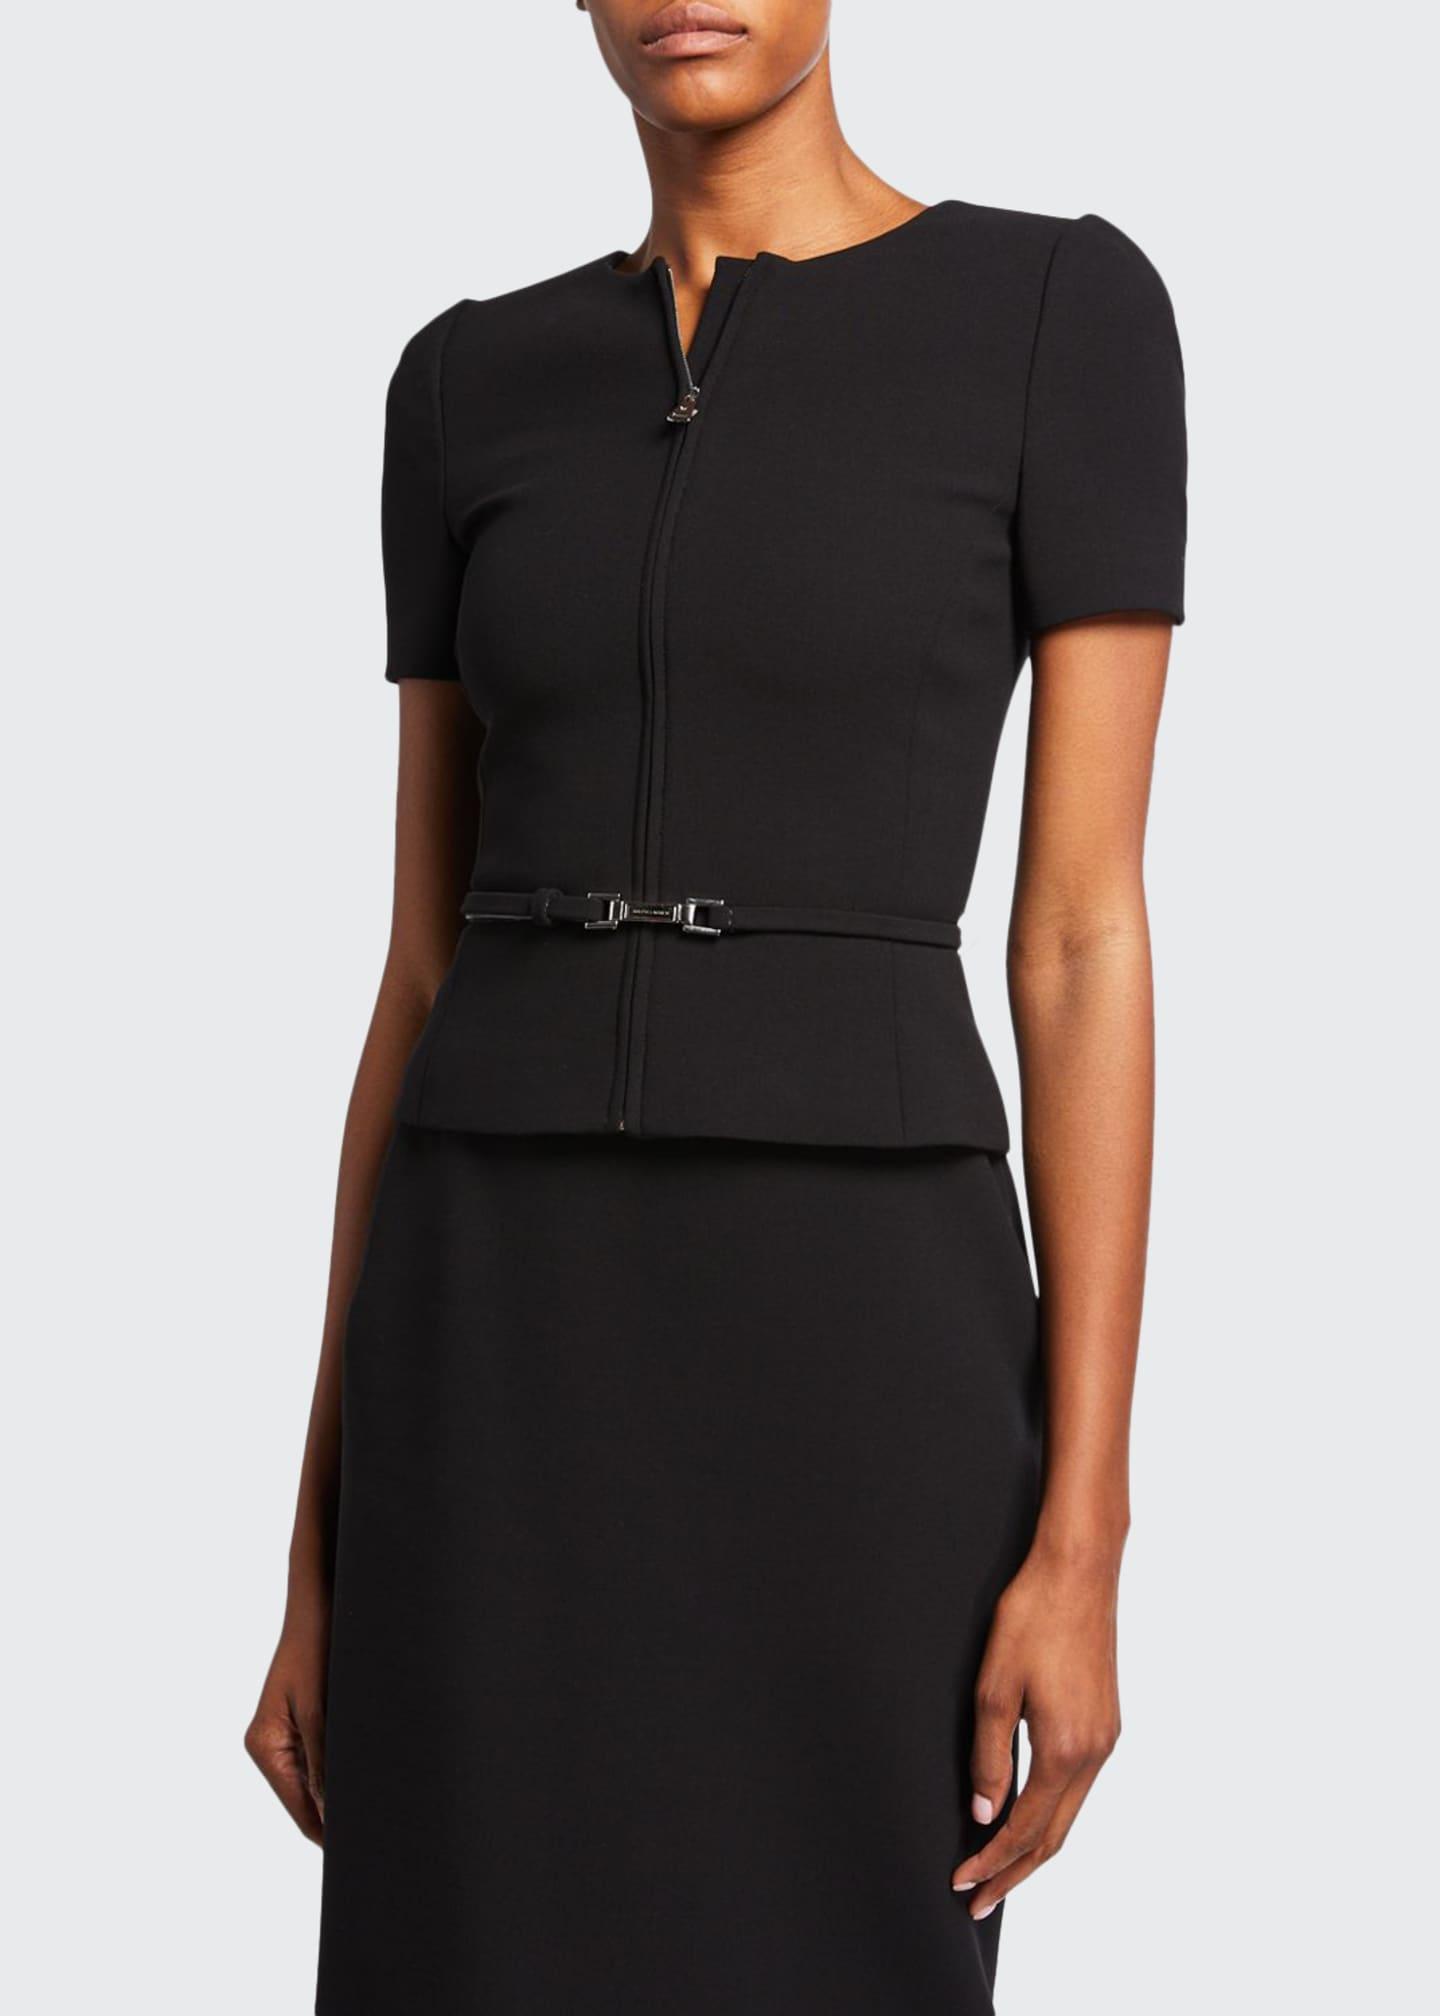 Ralph Lauren Collection Azalea Short-Sleeve Wool Crepe Jacket